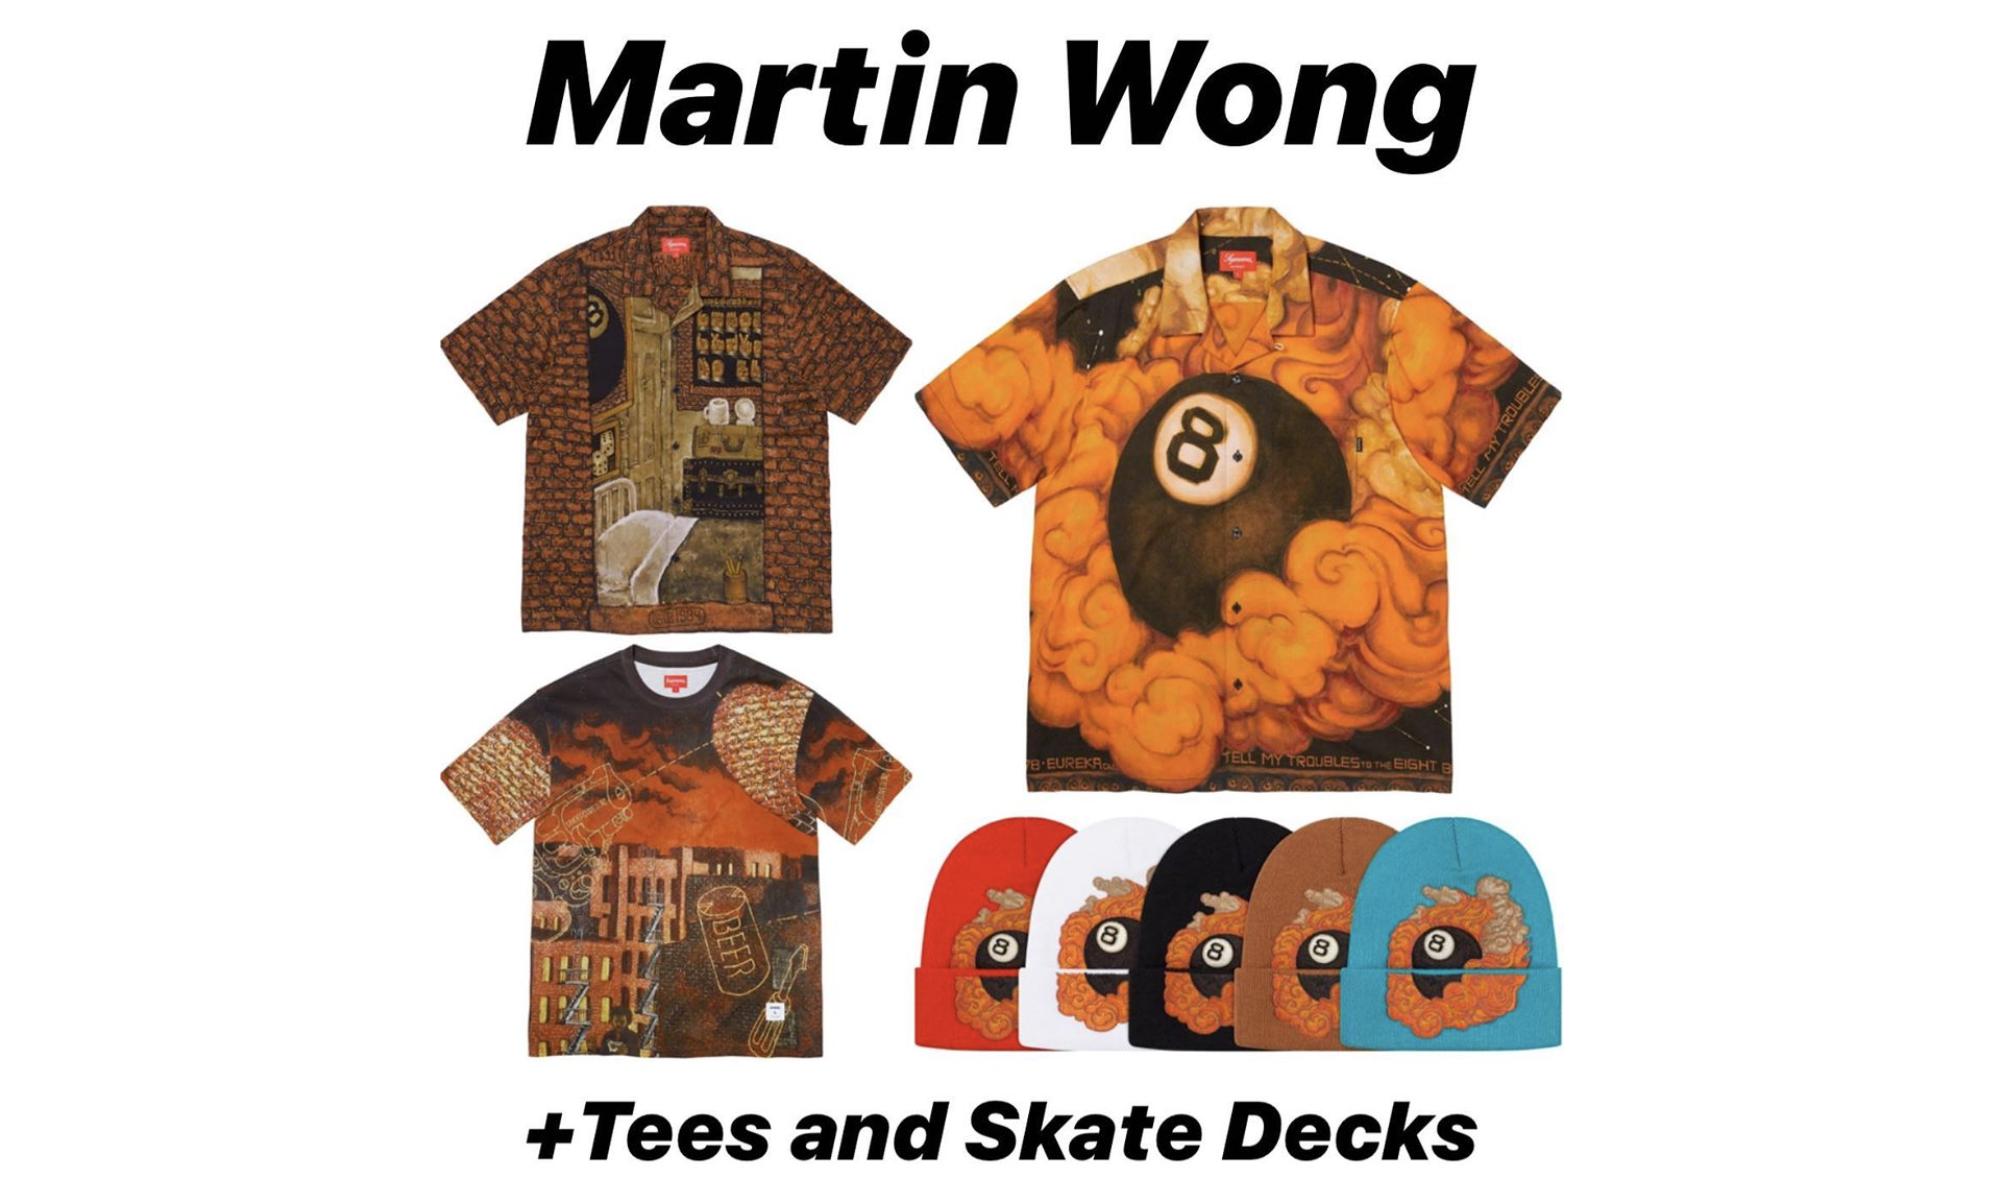 Supreme x Martin Wong 联名系列也将会在本周发售